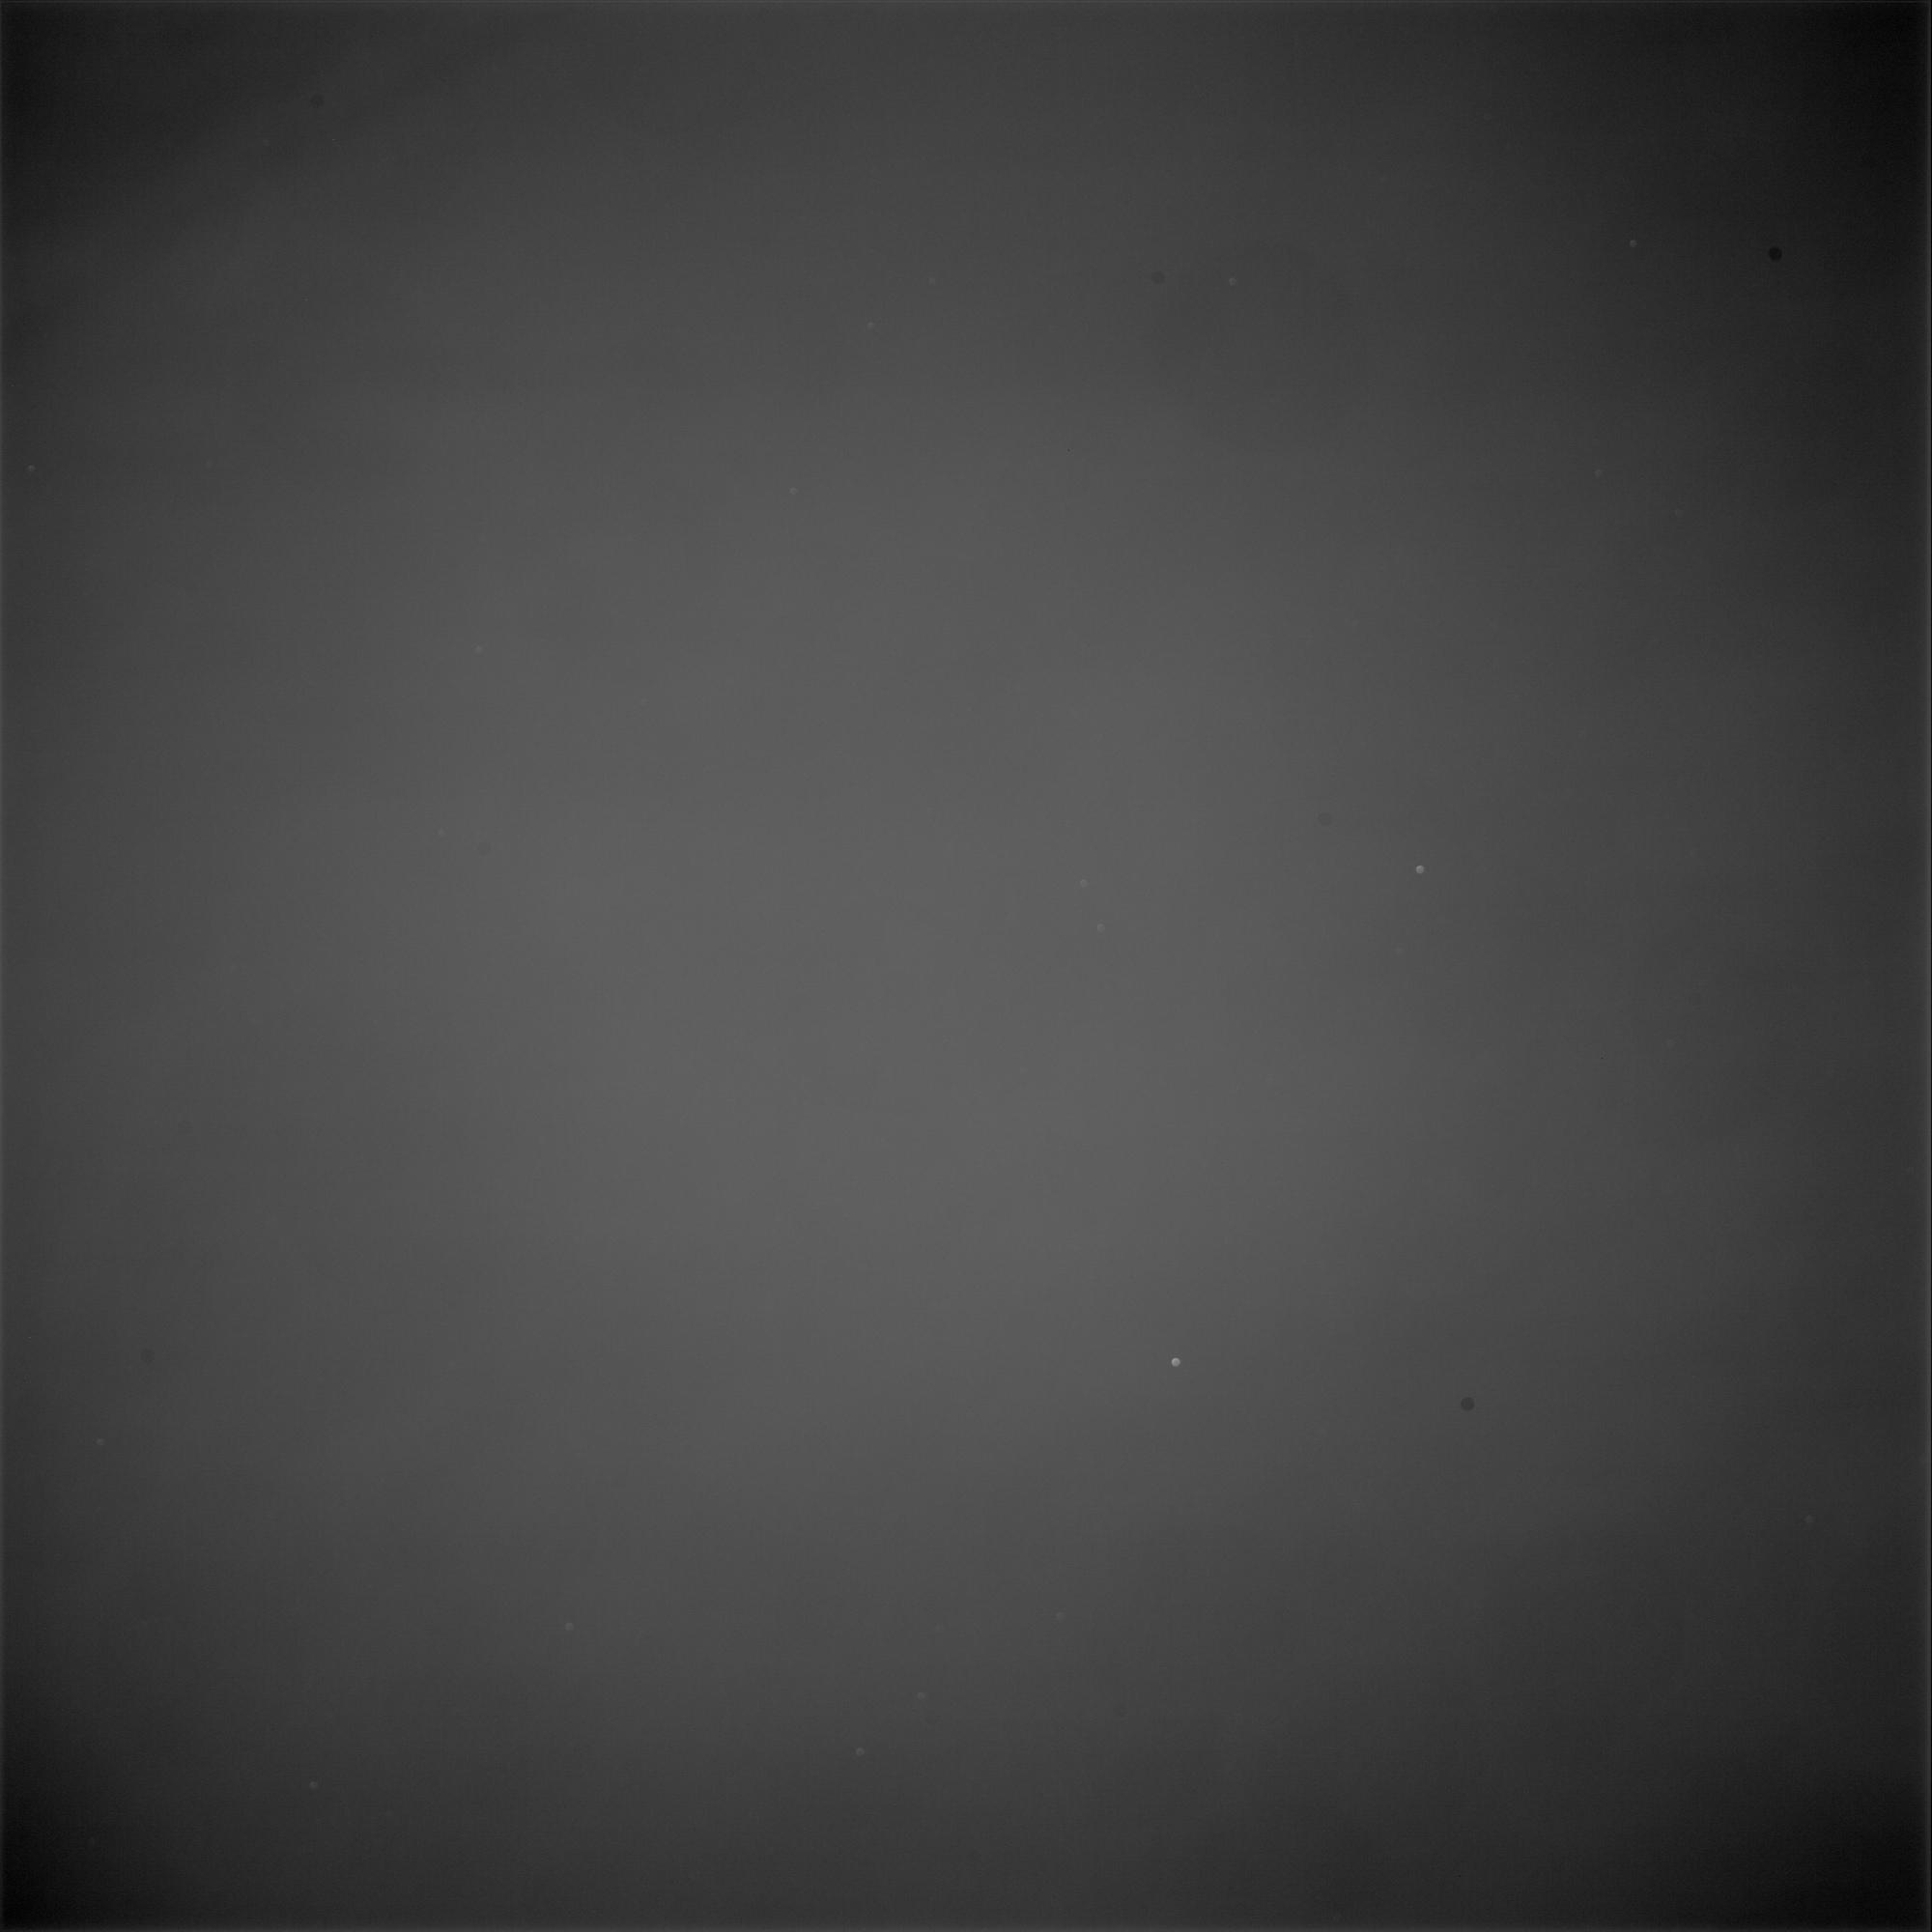 Flat_Red_3s_1x1_E_-20.03357.jpg